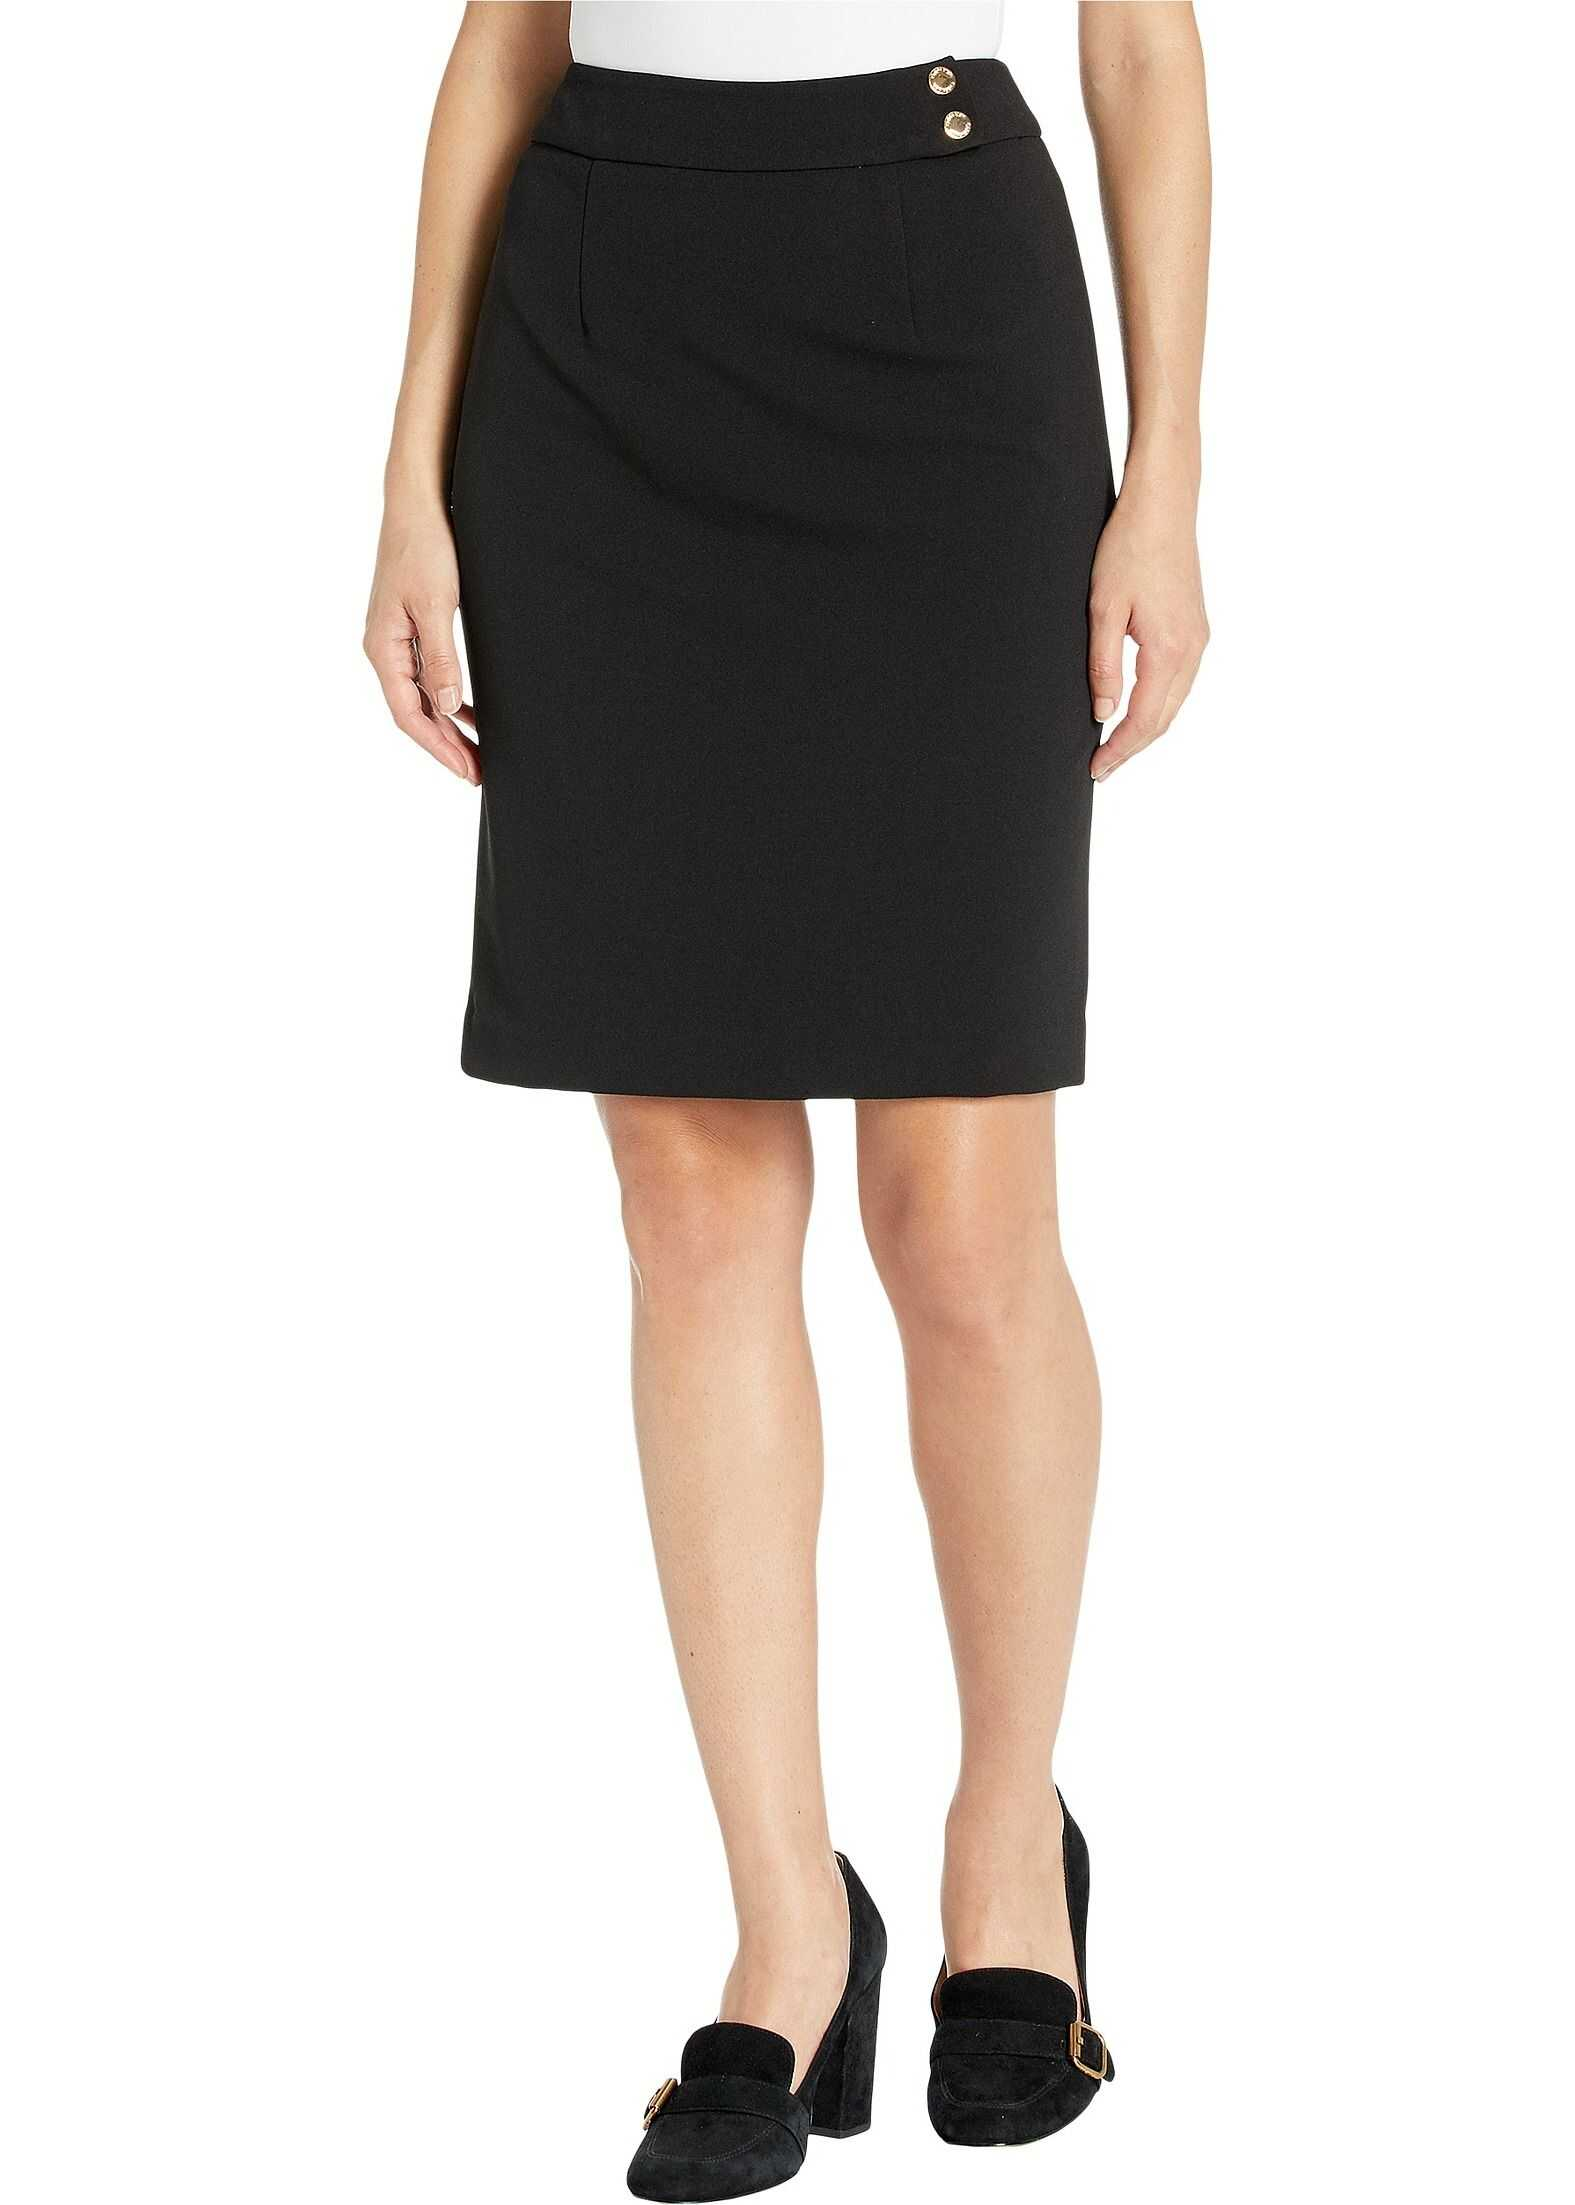 Calvin Klein Button Detail Skirt Black